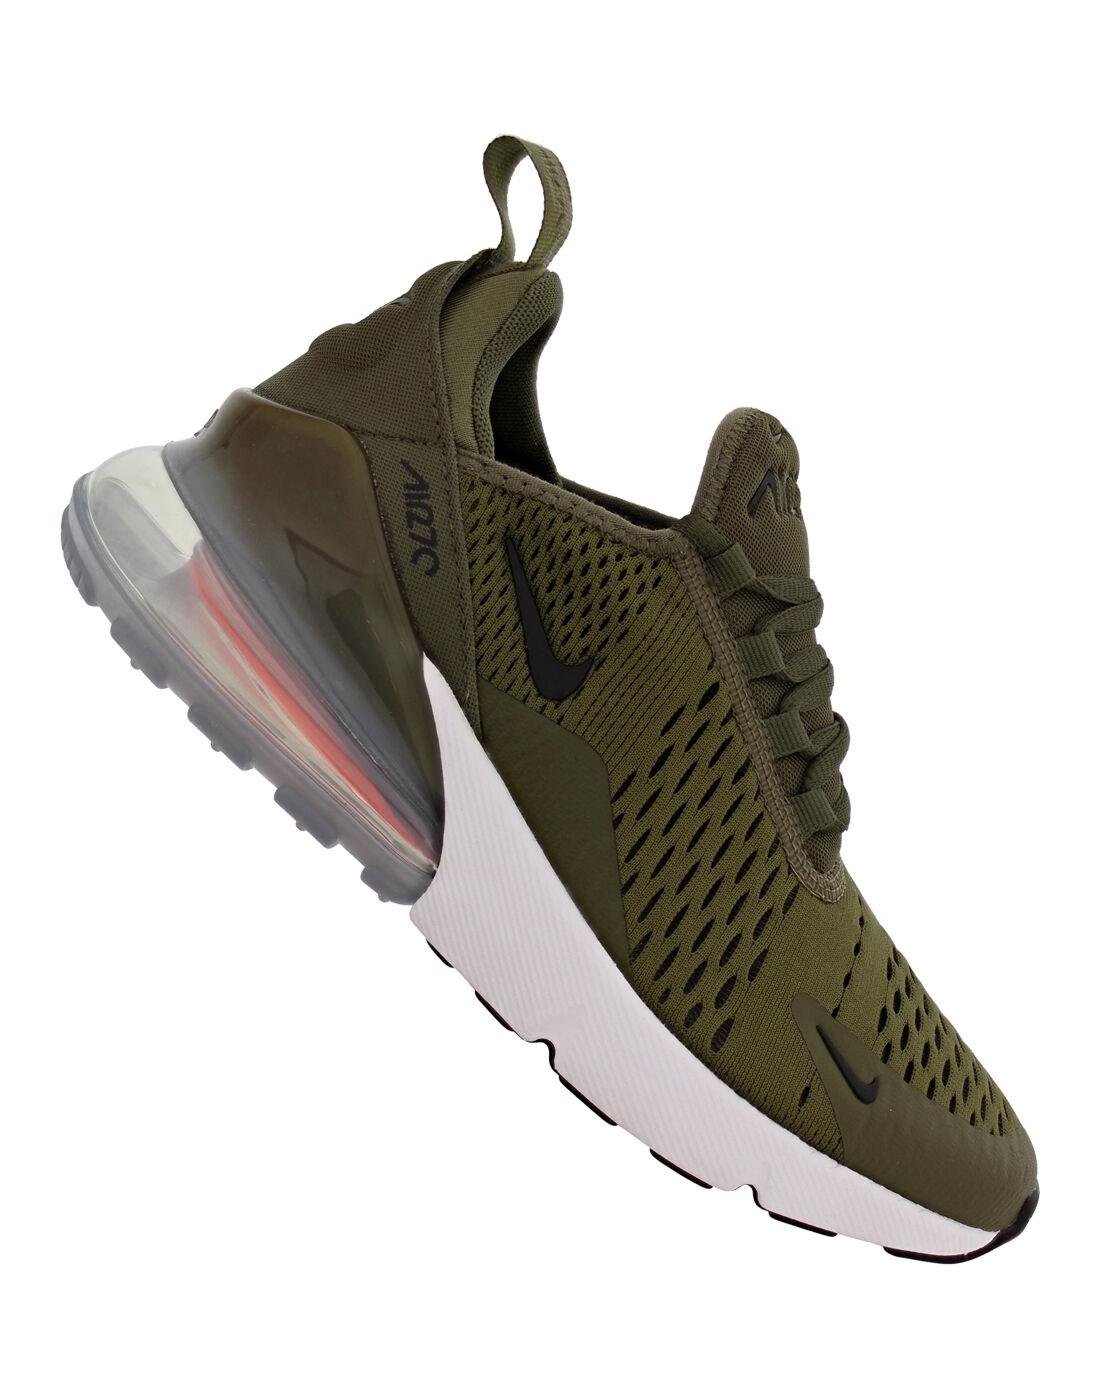 Kids Nike Air Max 270 Trainers   Green